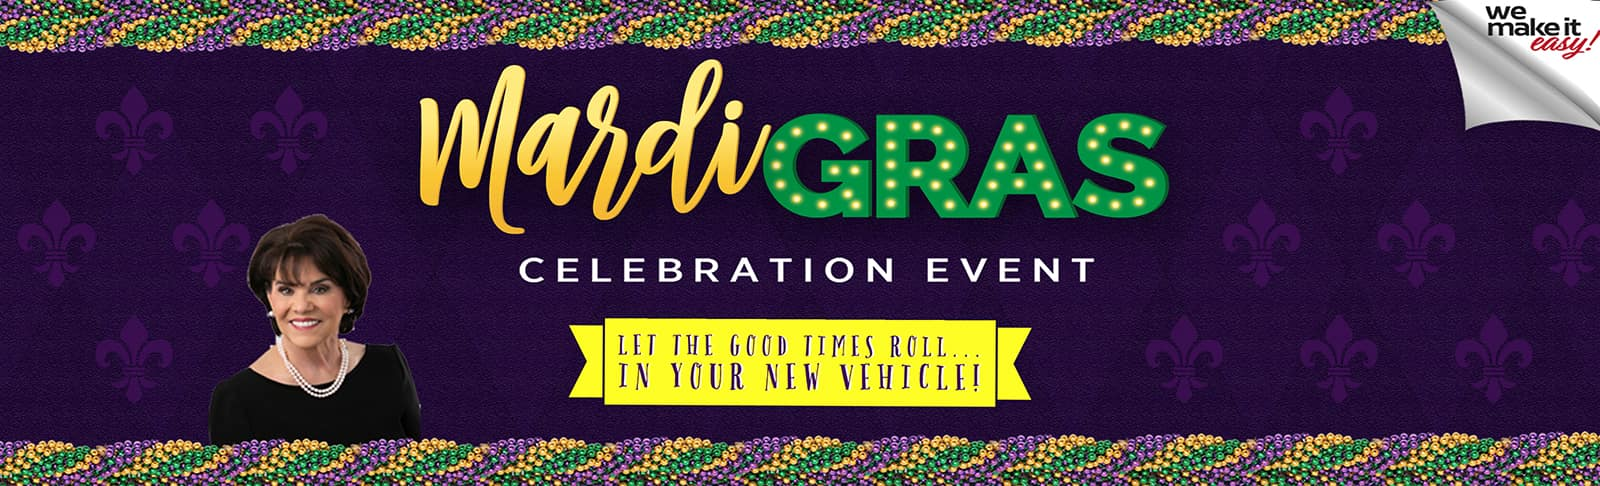 Mardis Gras Celebration